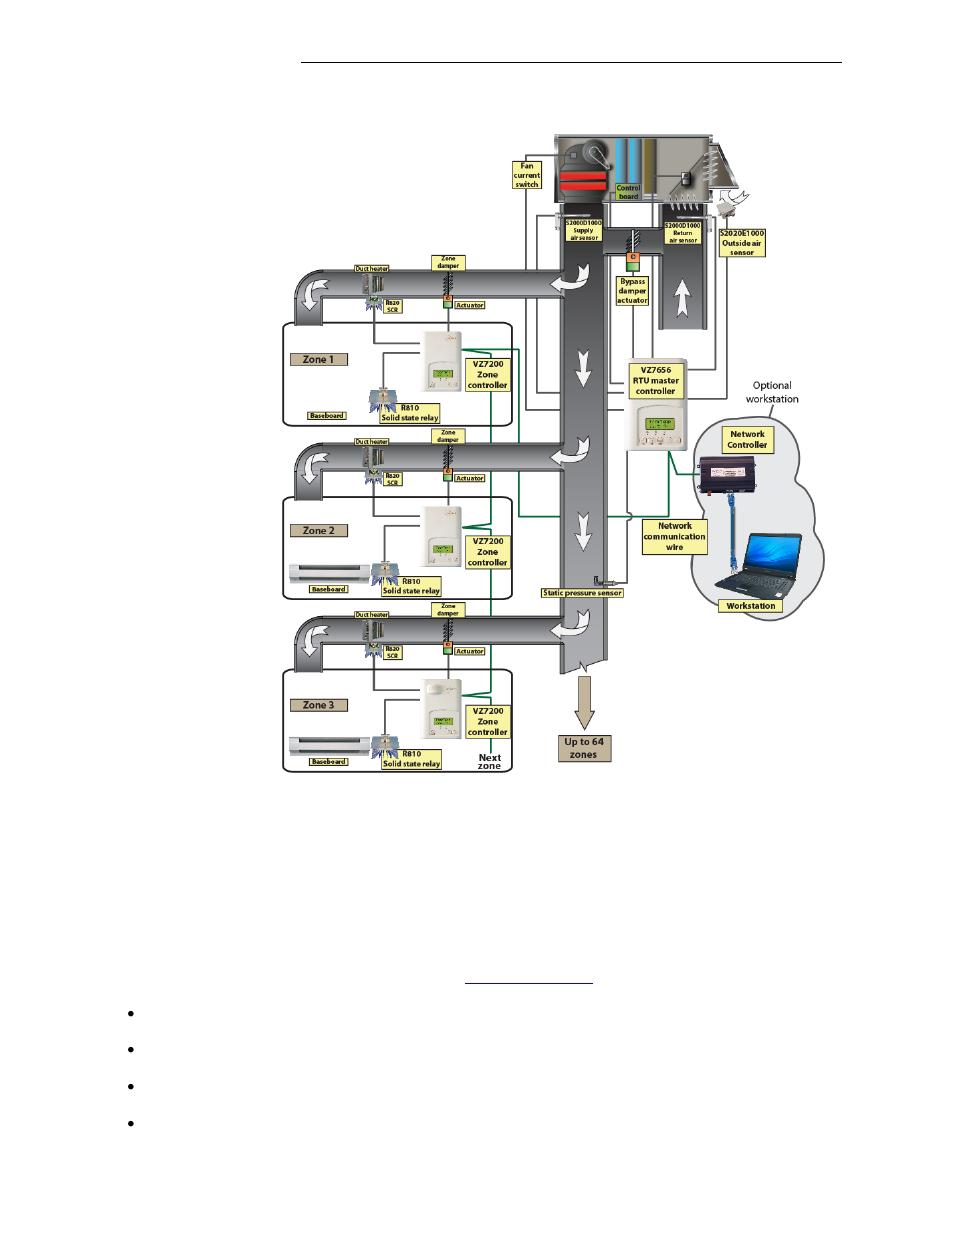 viconics vz7260 x vz7656 x bacnet installation manual user manual rh manualsdir com Trane Wiring Diagrams RJ45 Wiring-Diagram